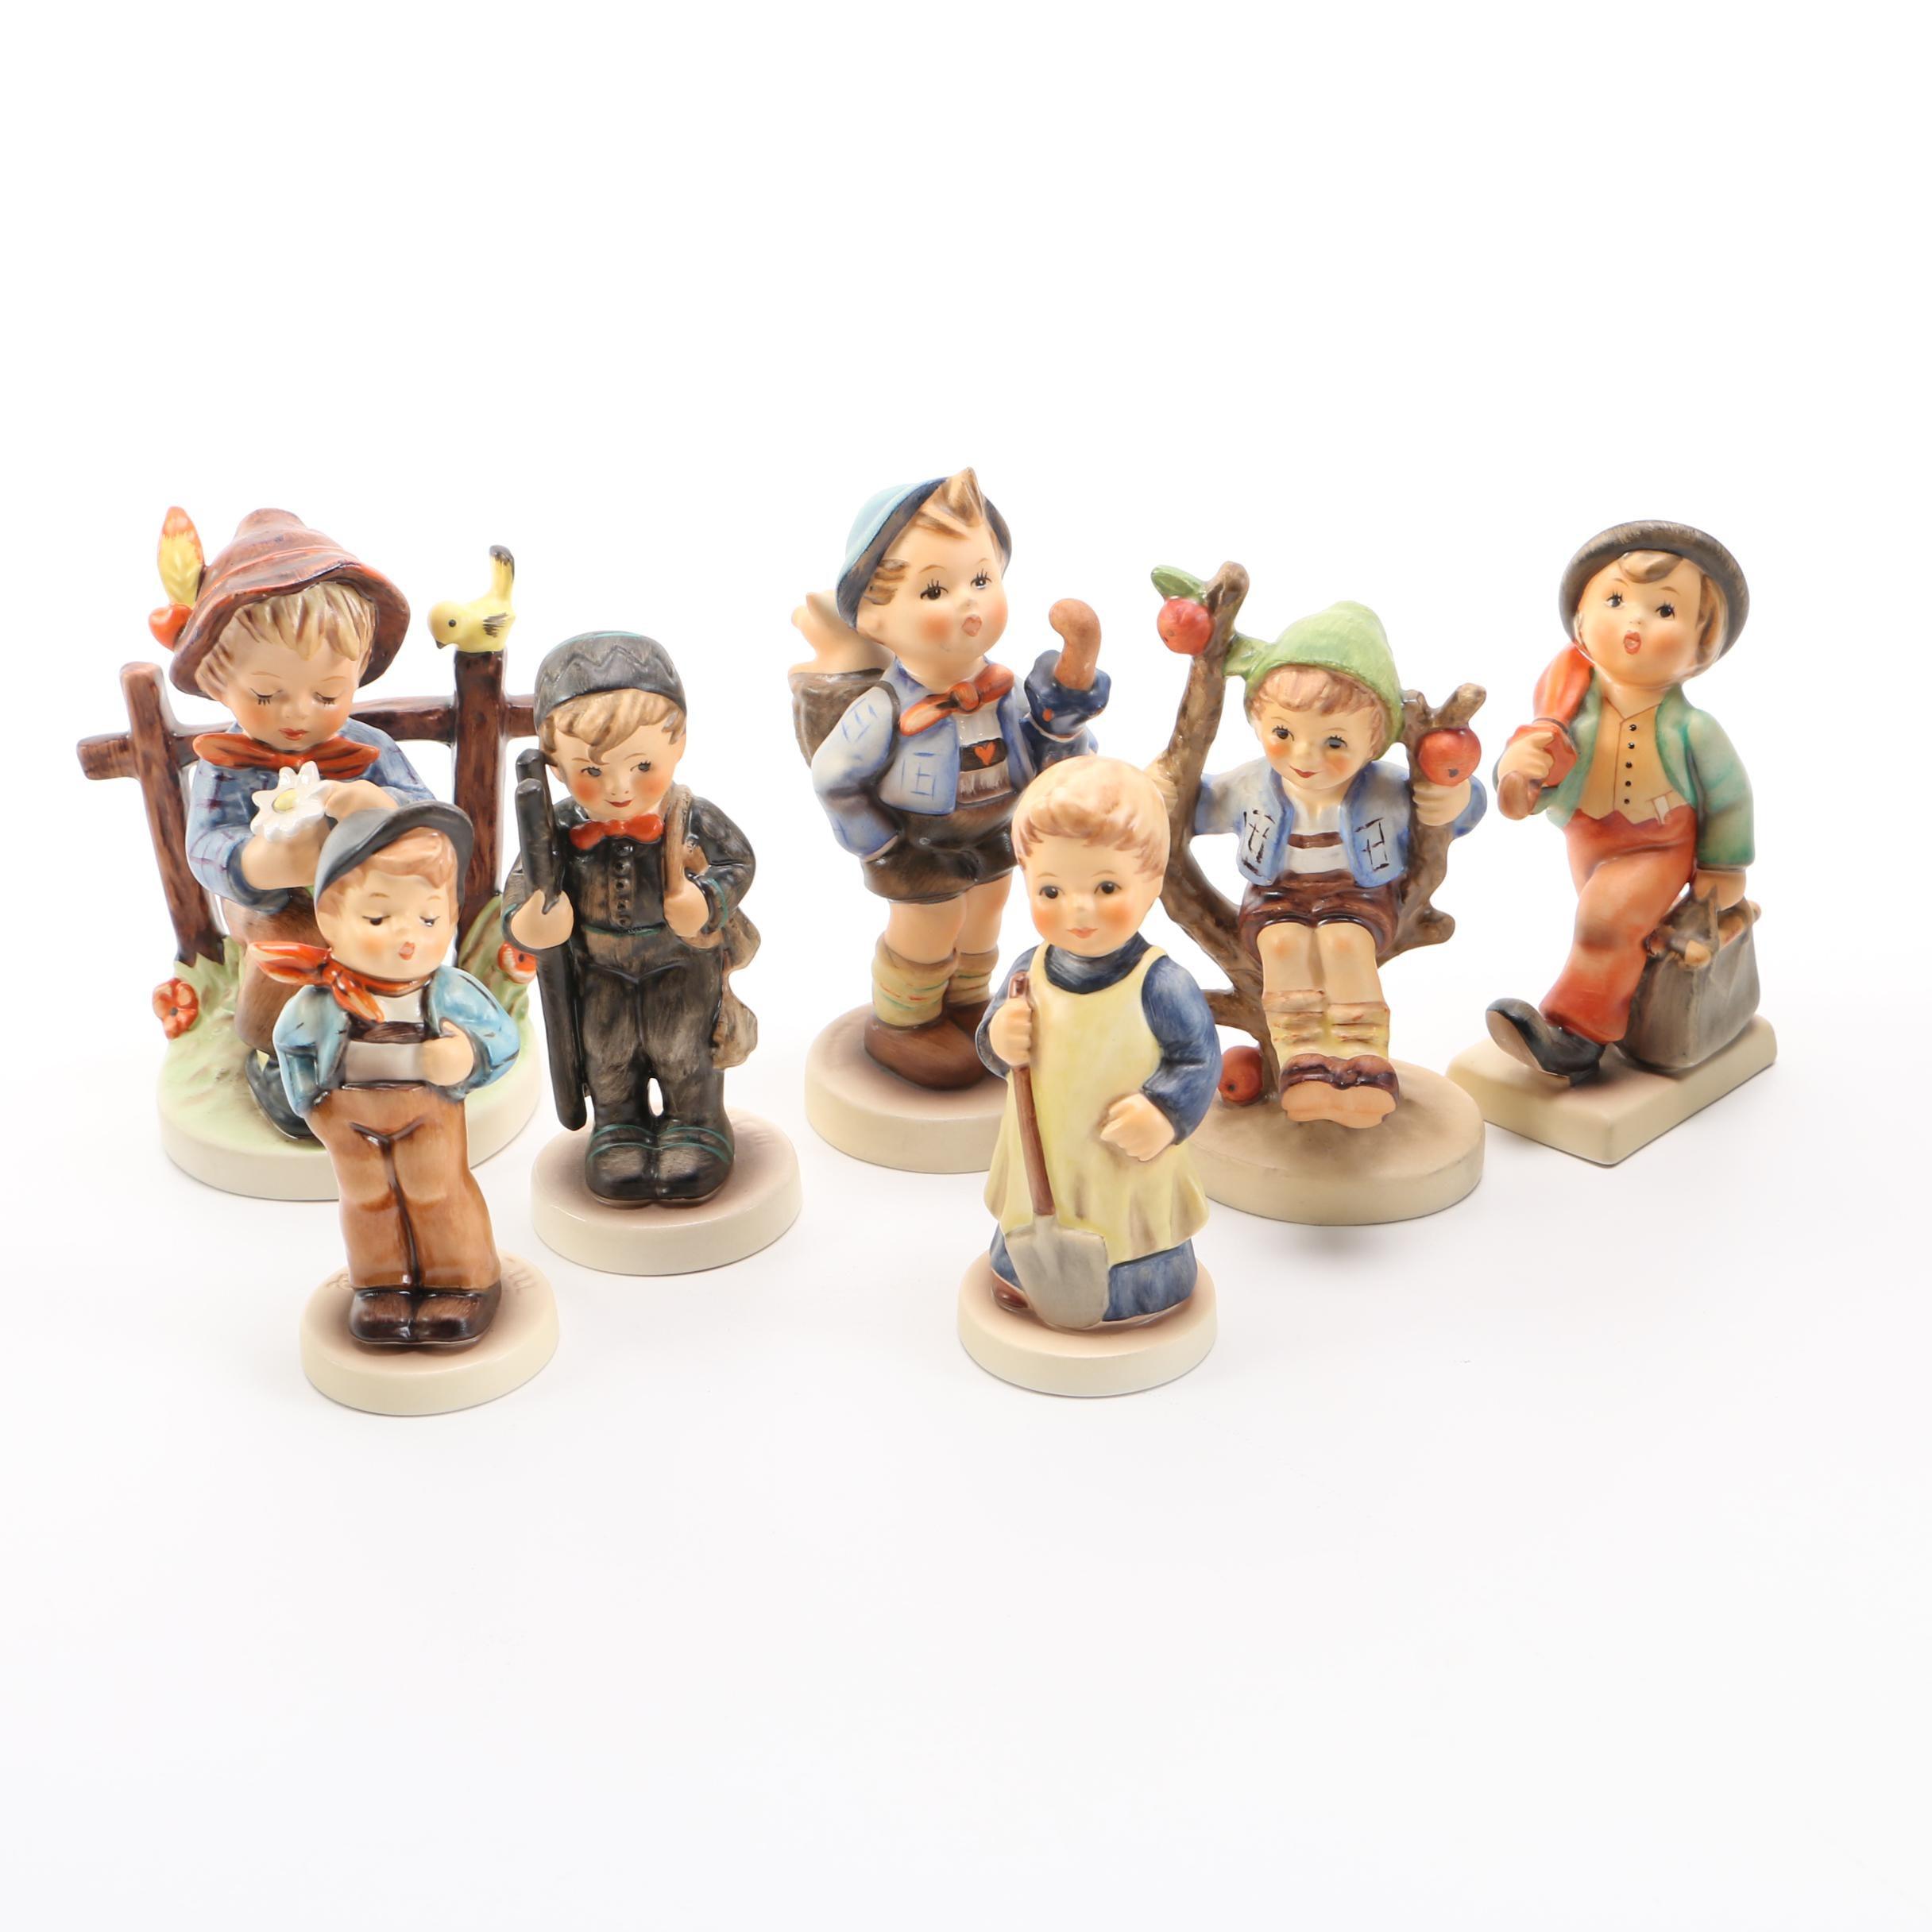 Variety Goebel Figurines